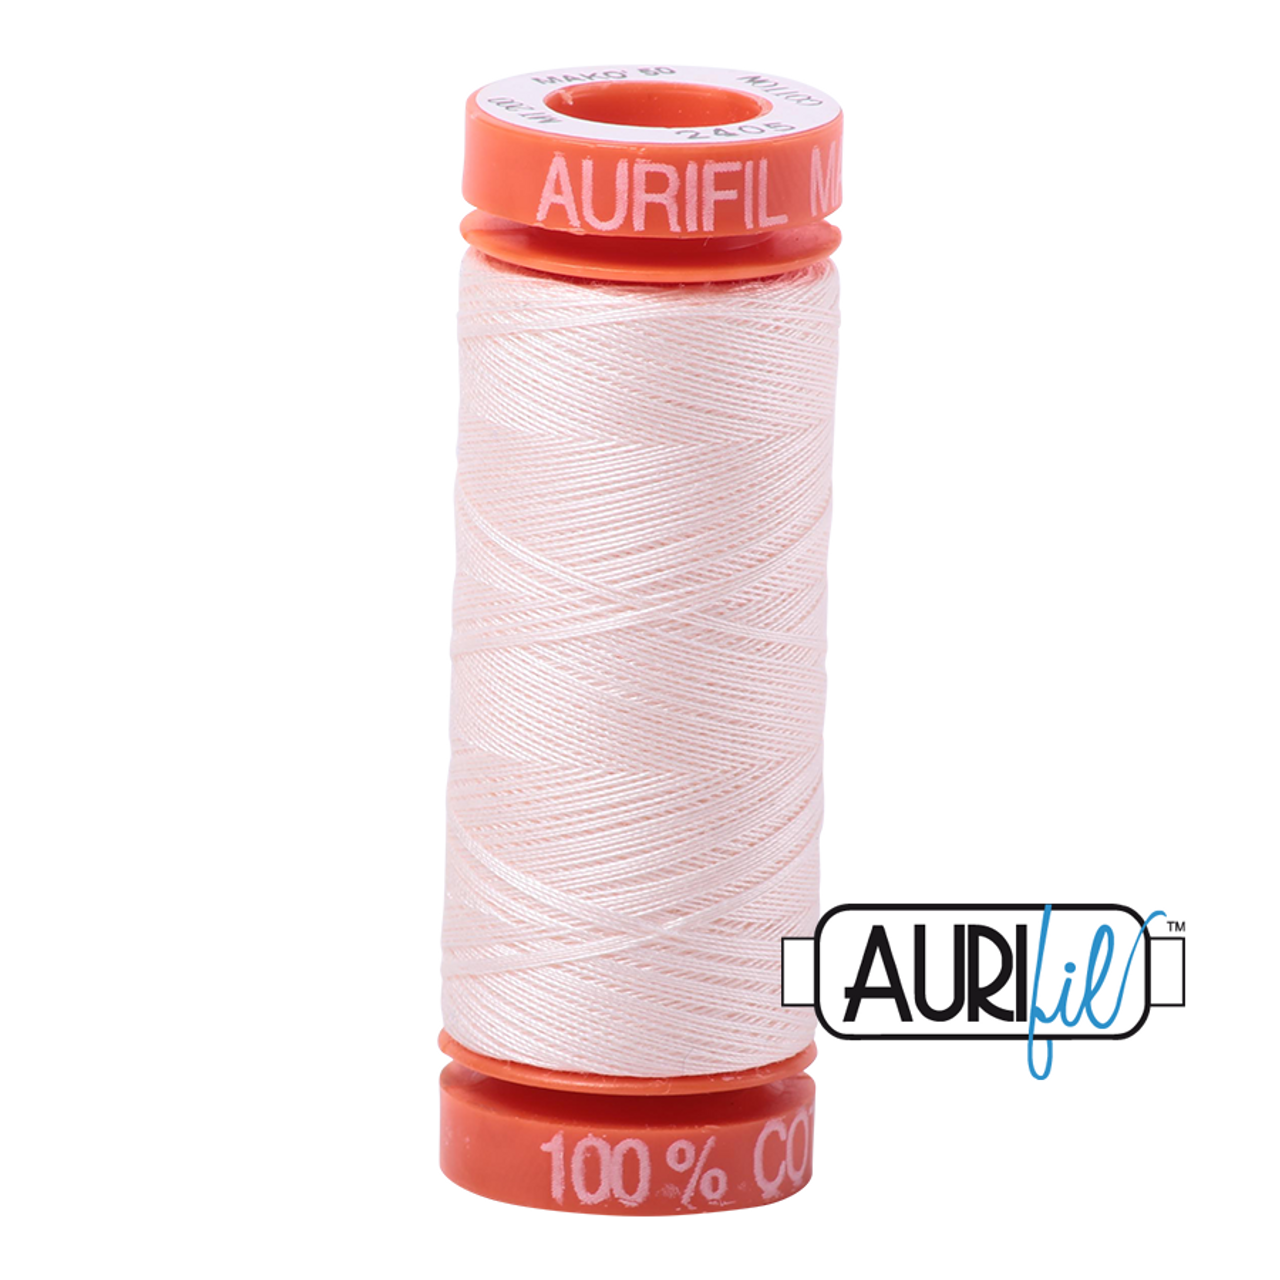 150m 2460 40wt Aurifil Cotton Quilting Thread Dark Carmine Red